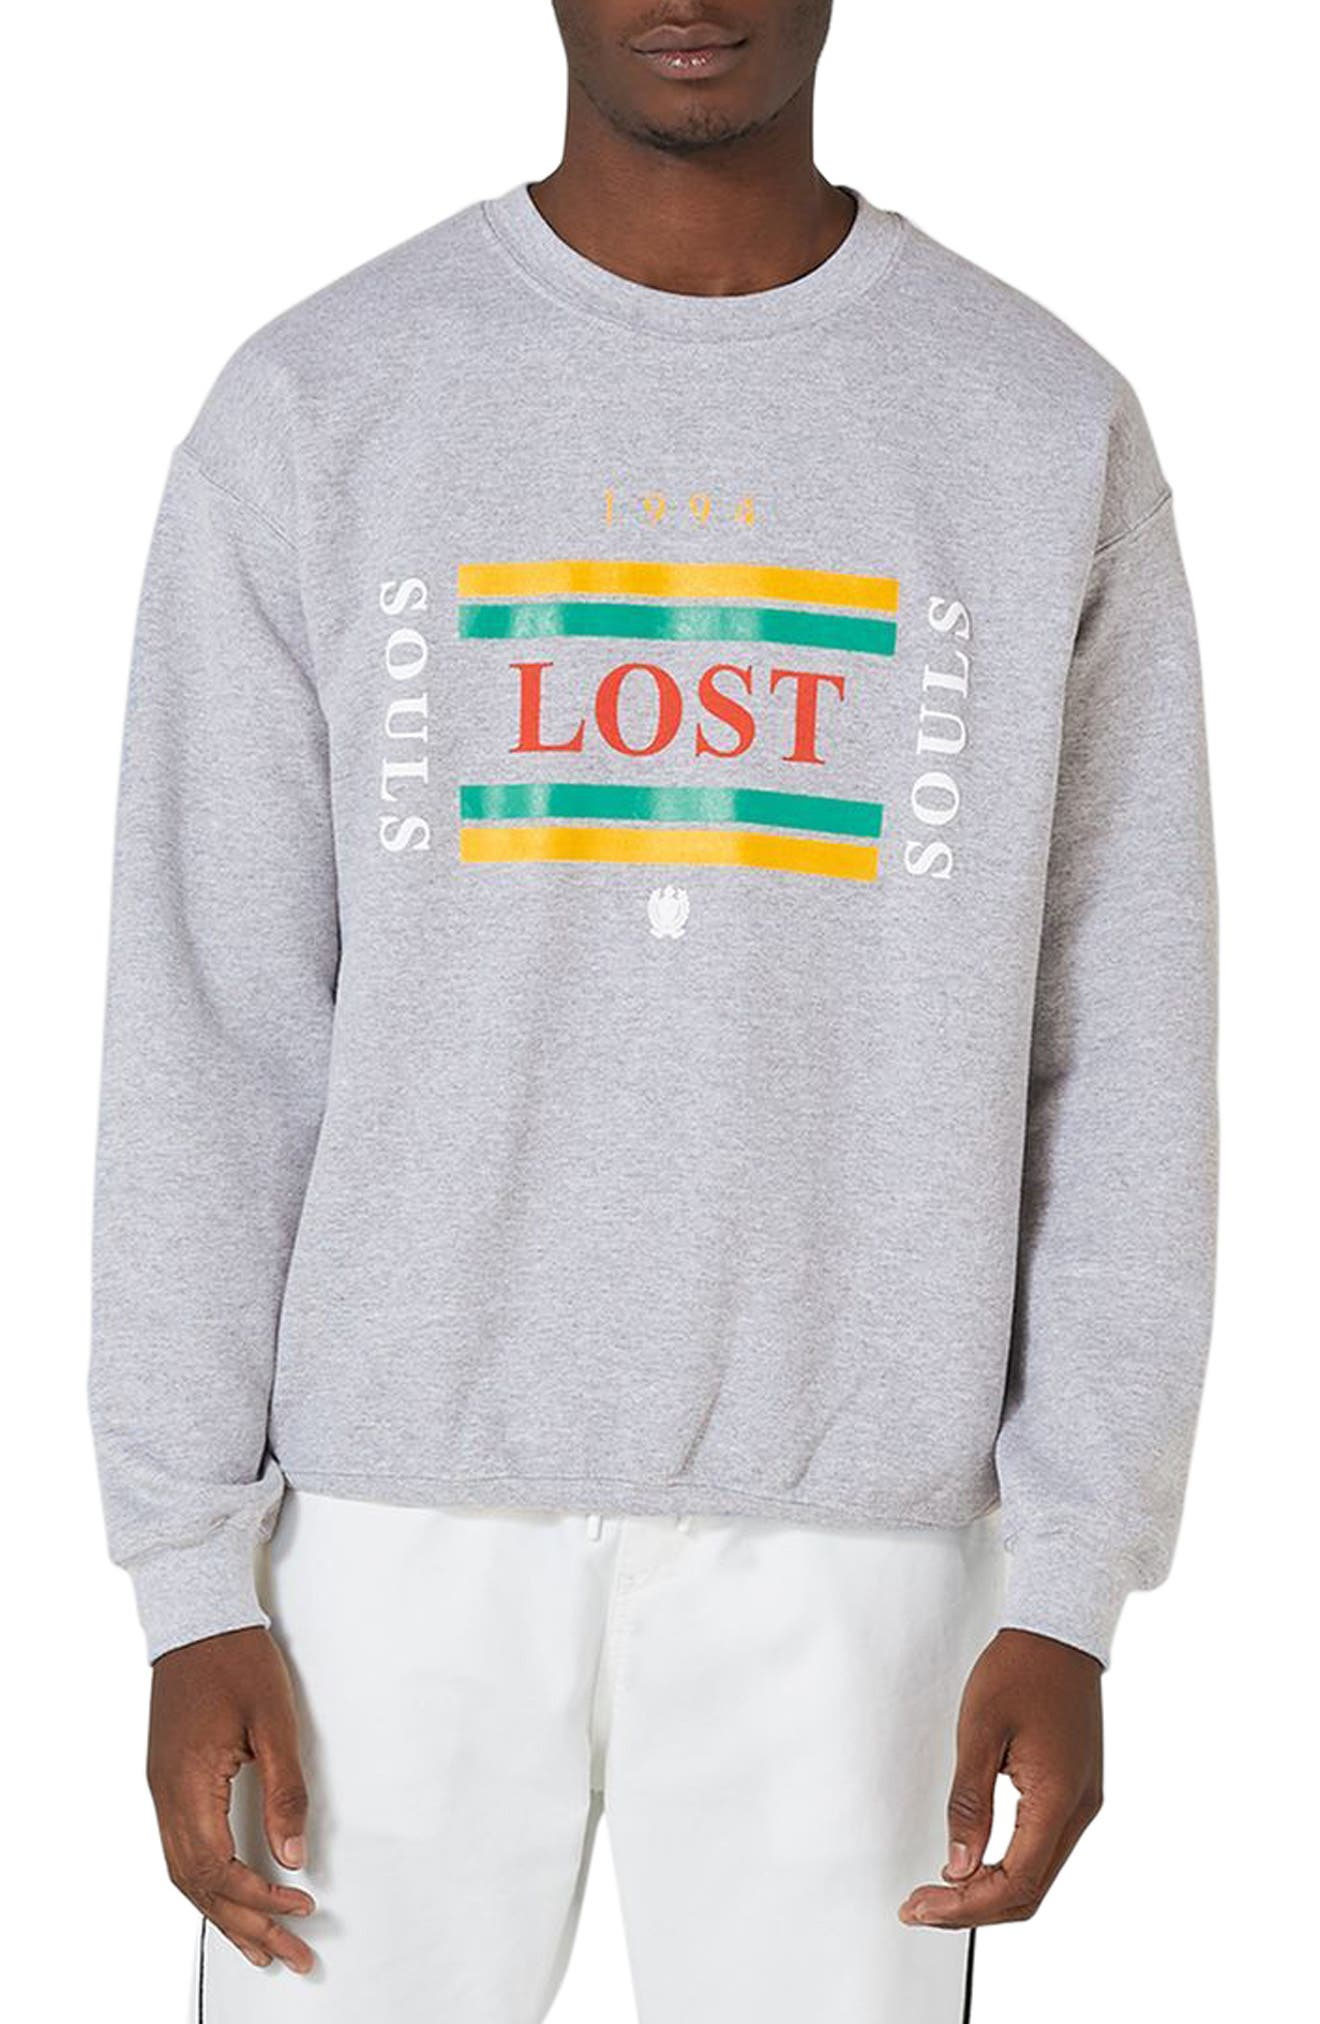 Lost Souls Graphic Sweatshirt,                             Main thumbnail 1, color,                             Light Grey